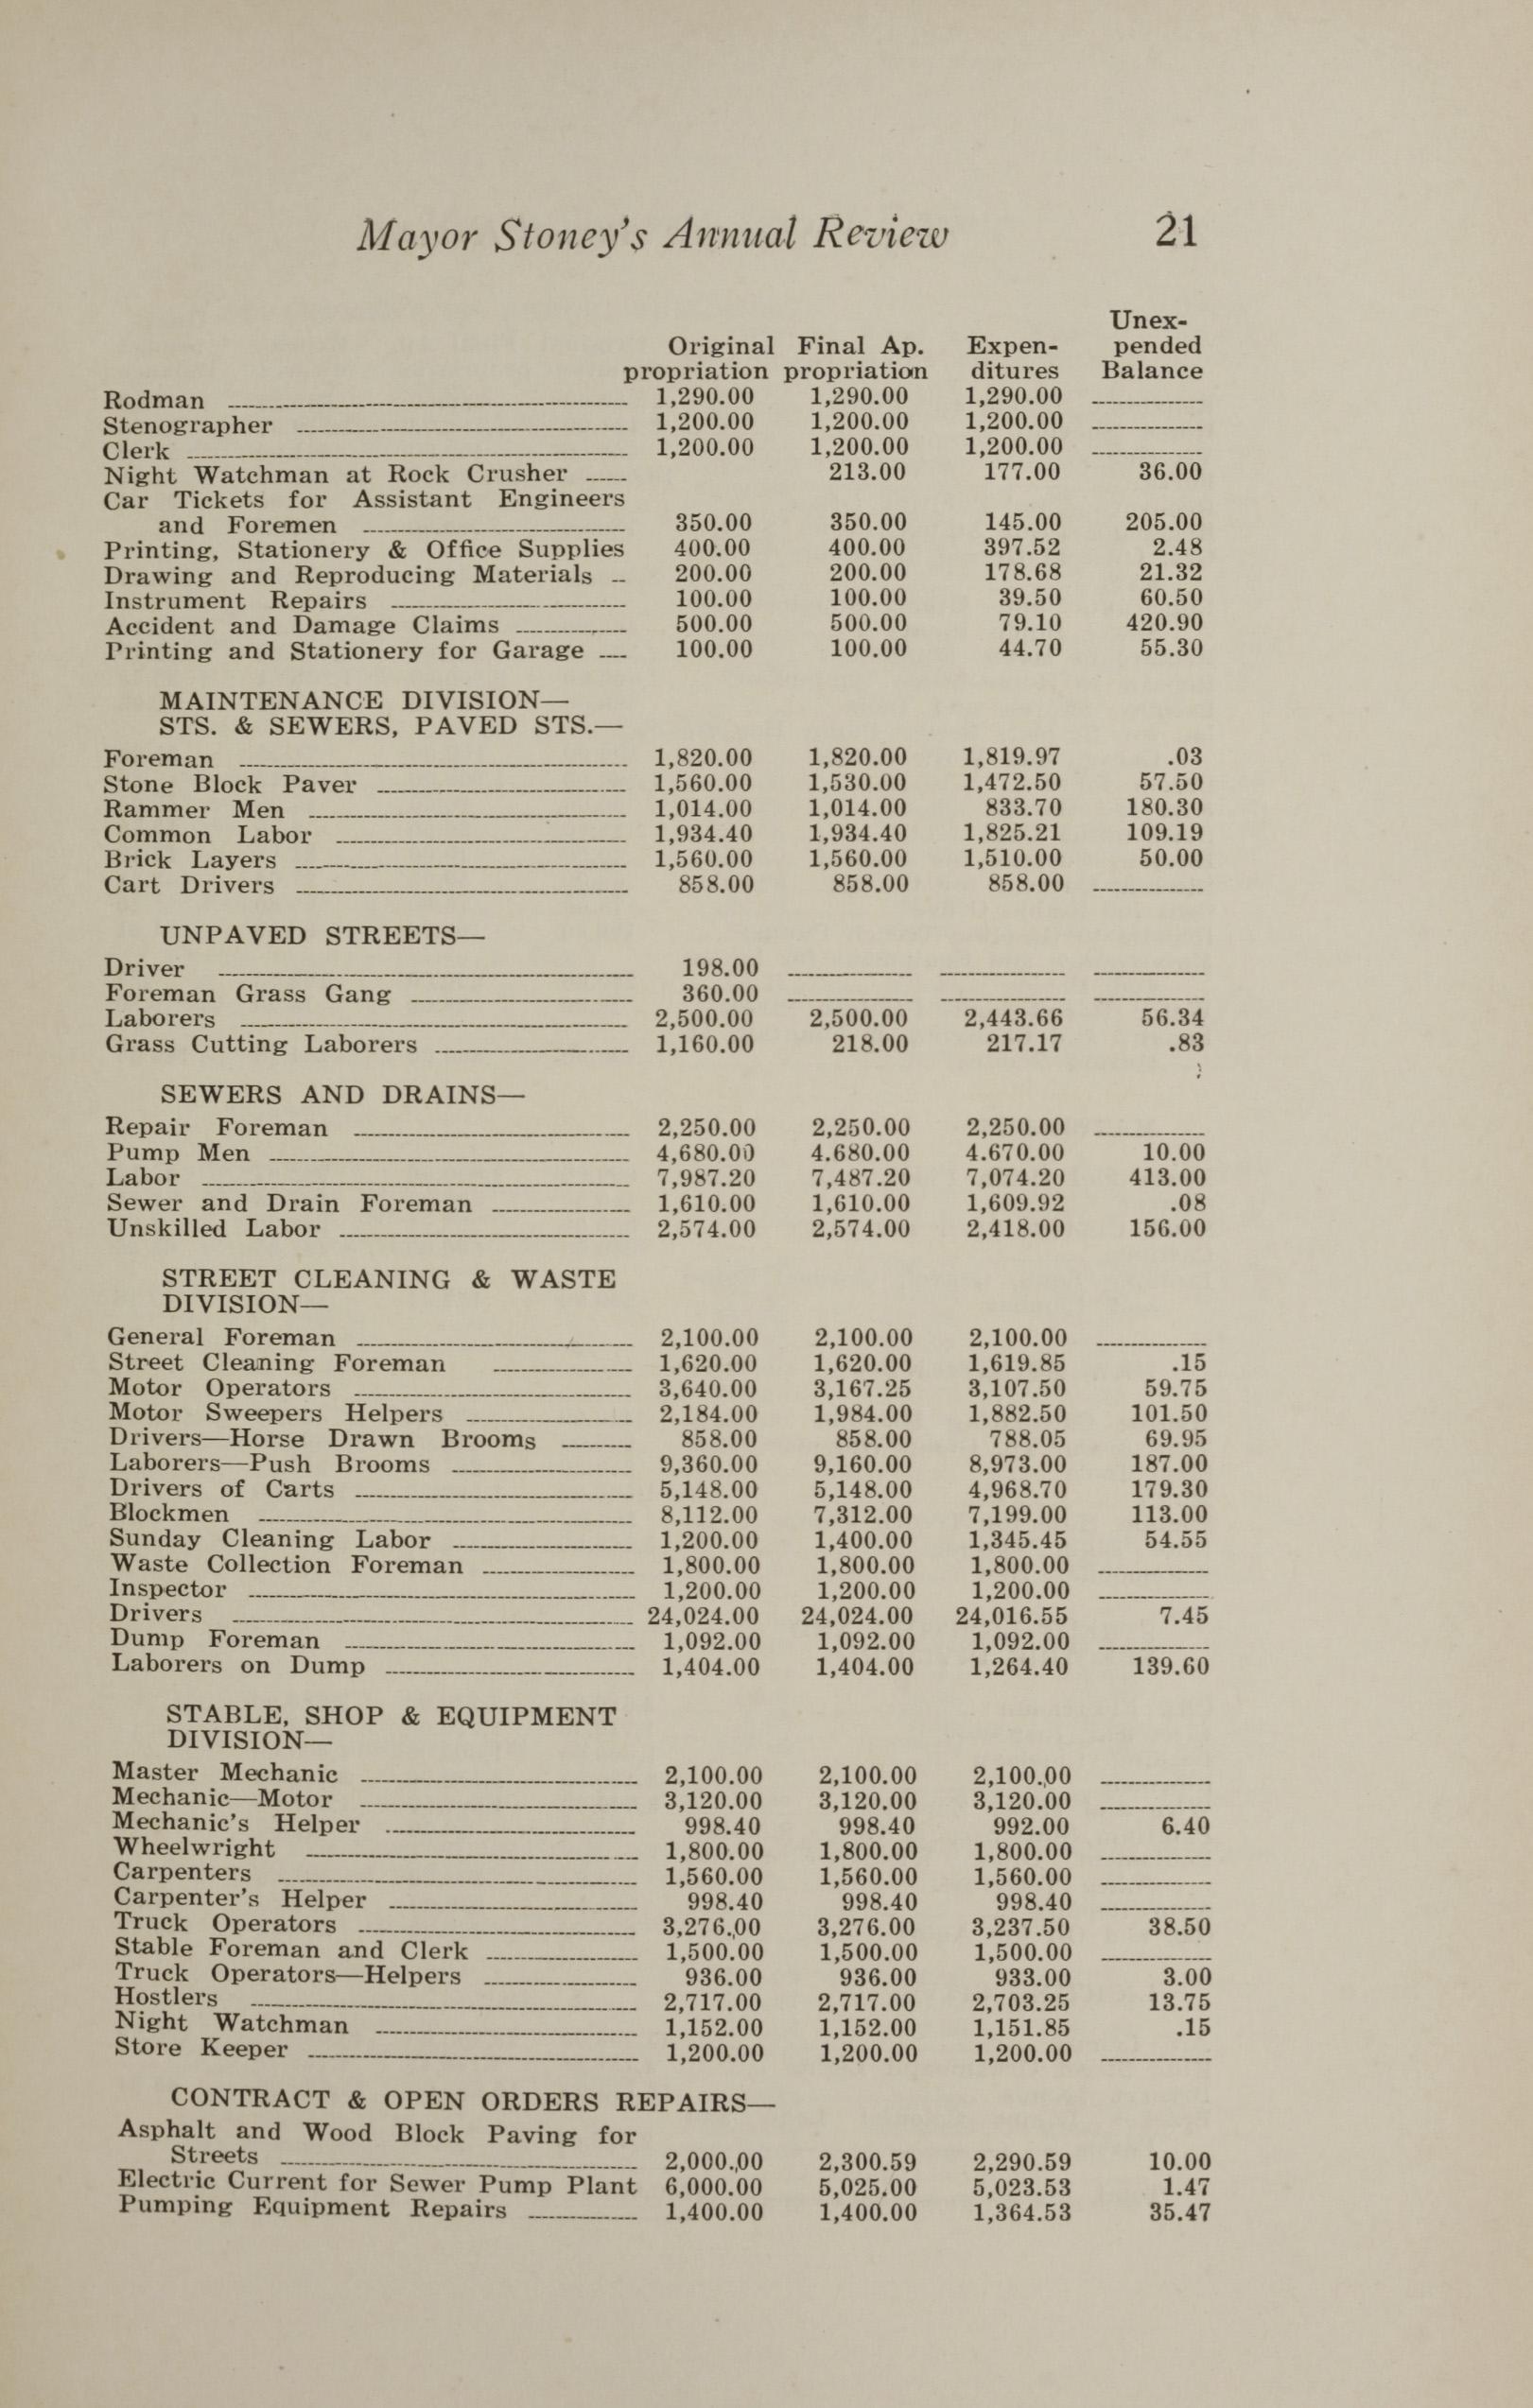 Charleston Yearbook, 1928, page 21